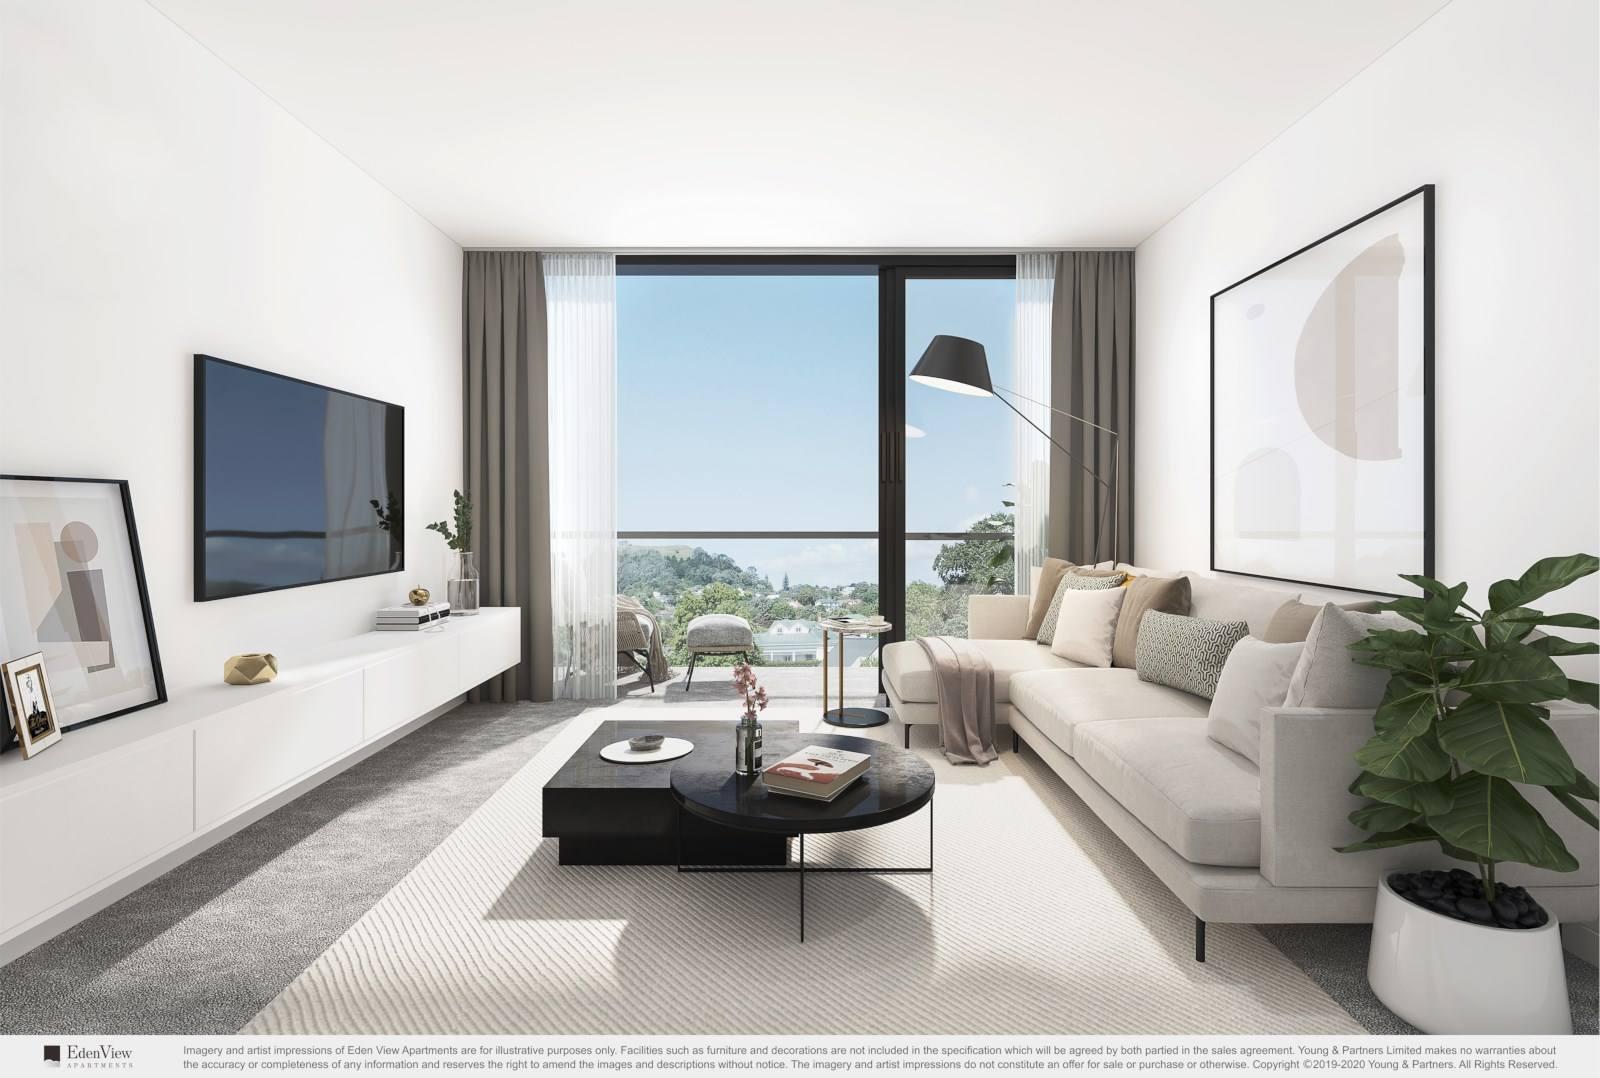 Mount Eden 1房 全新精品公寓 多户型可选 繁华区路段 好校云集 自住/投资不二选 Brand New Urban Apartment Lifestyle